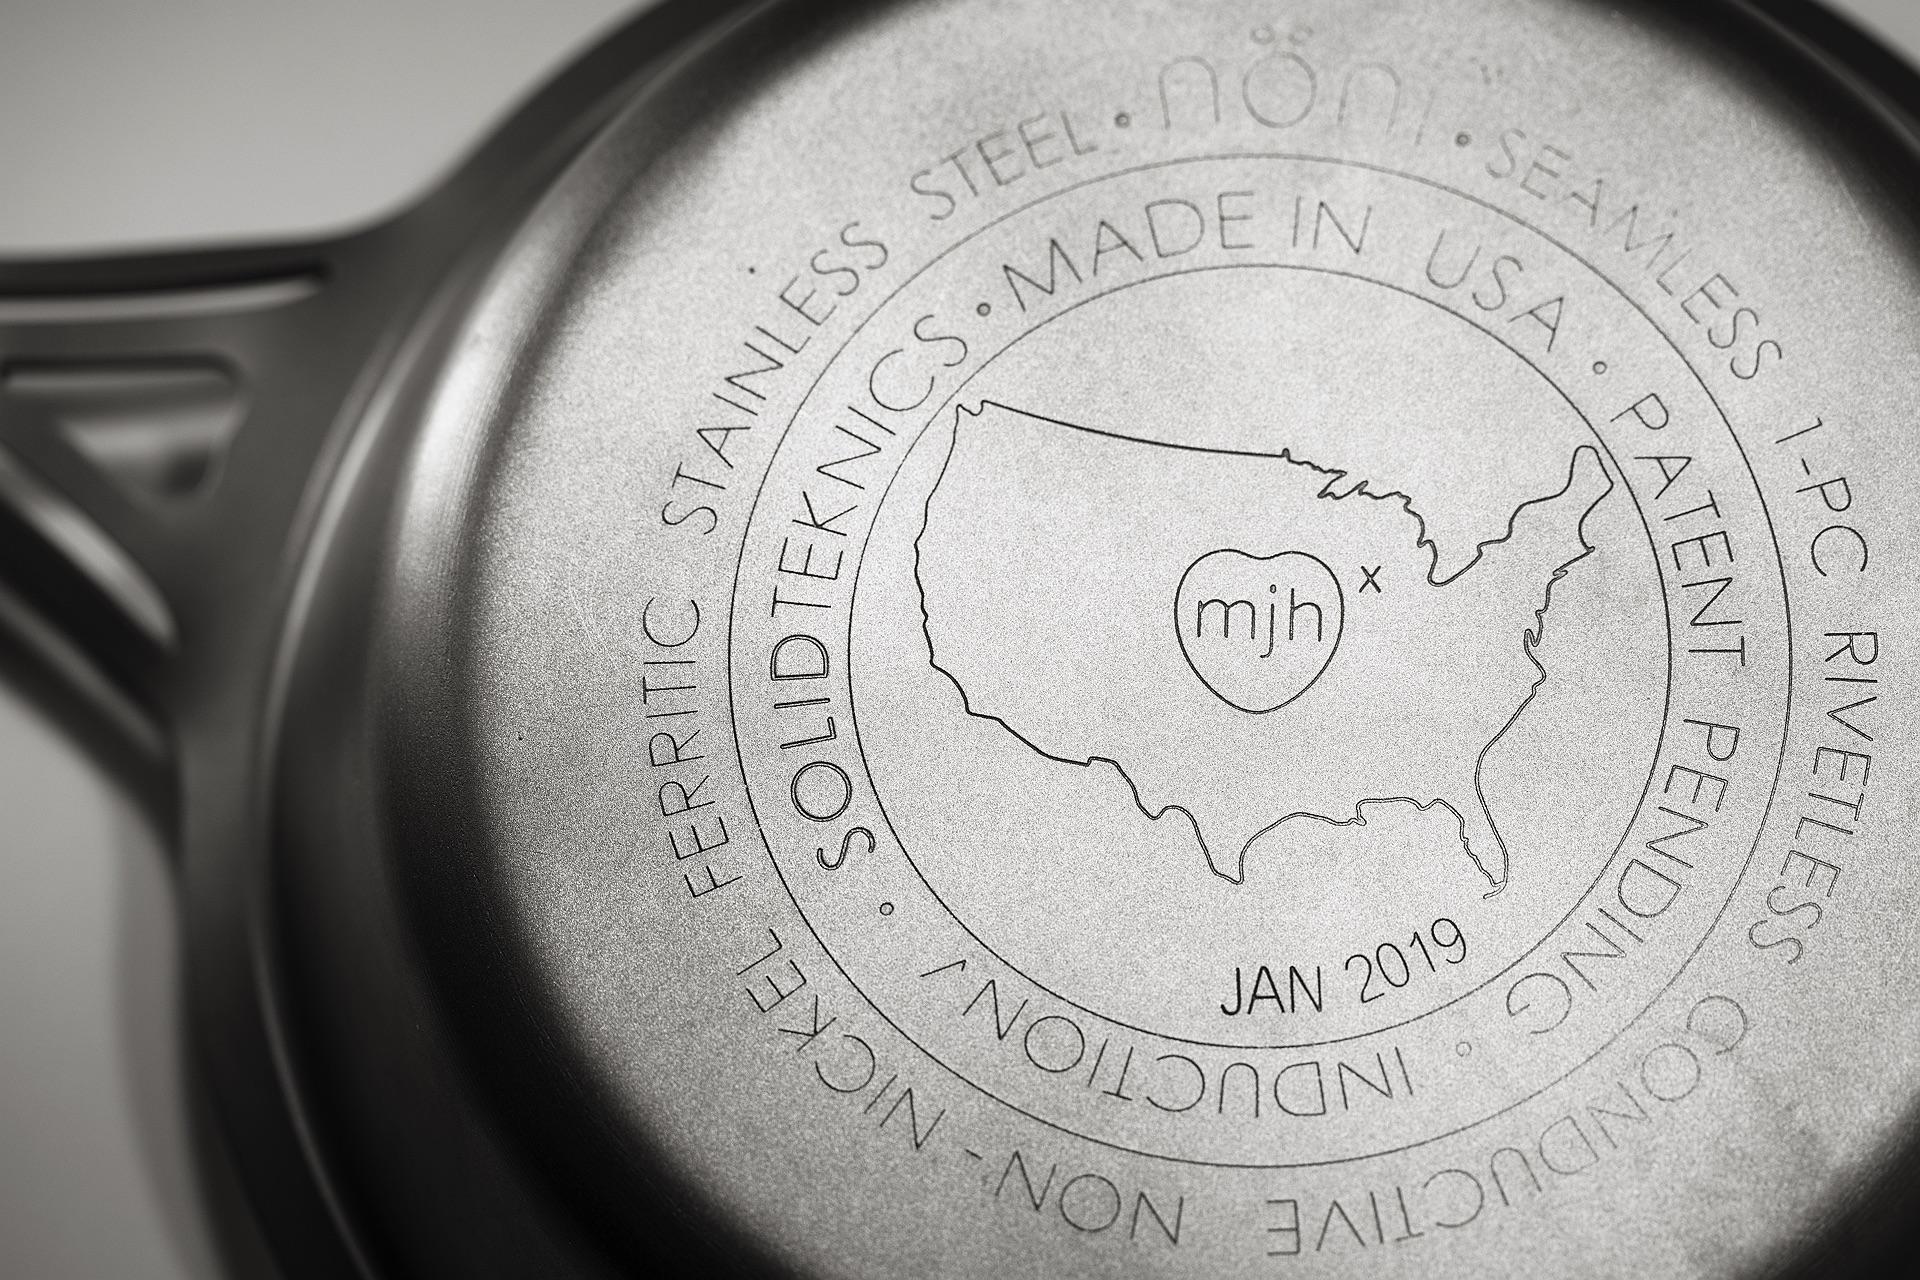 US NONI 8 inch saute pan stylised 05 (1).jpg